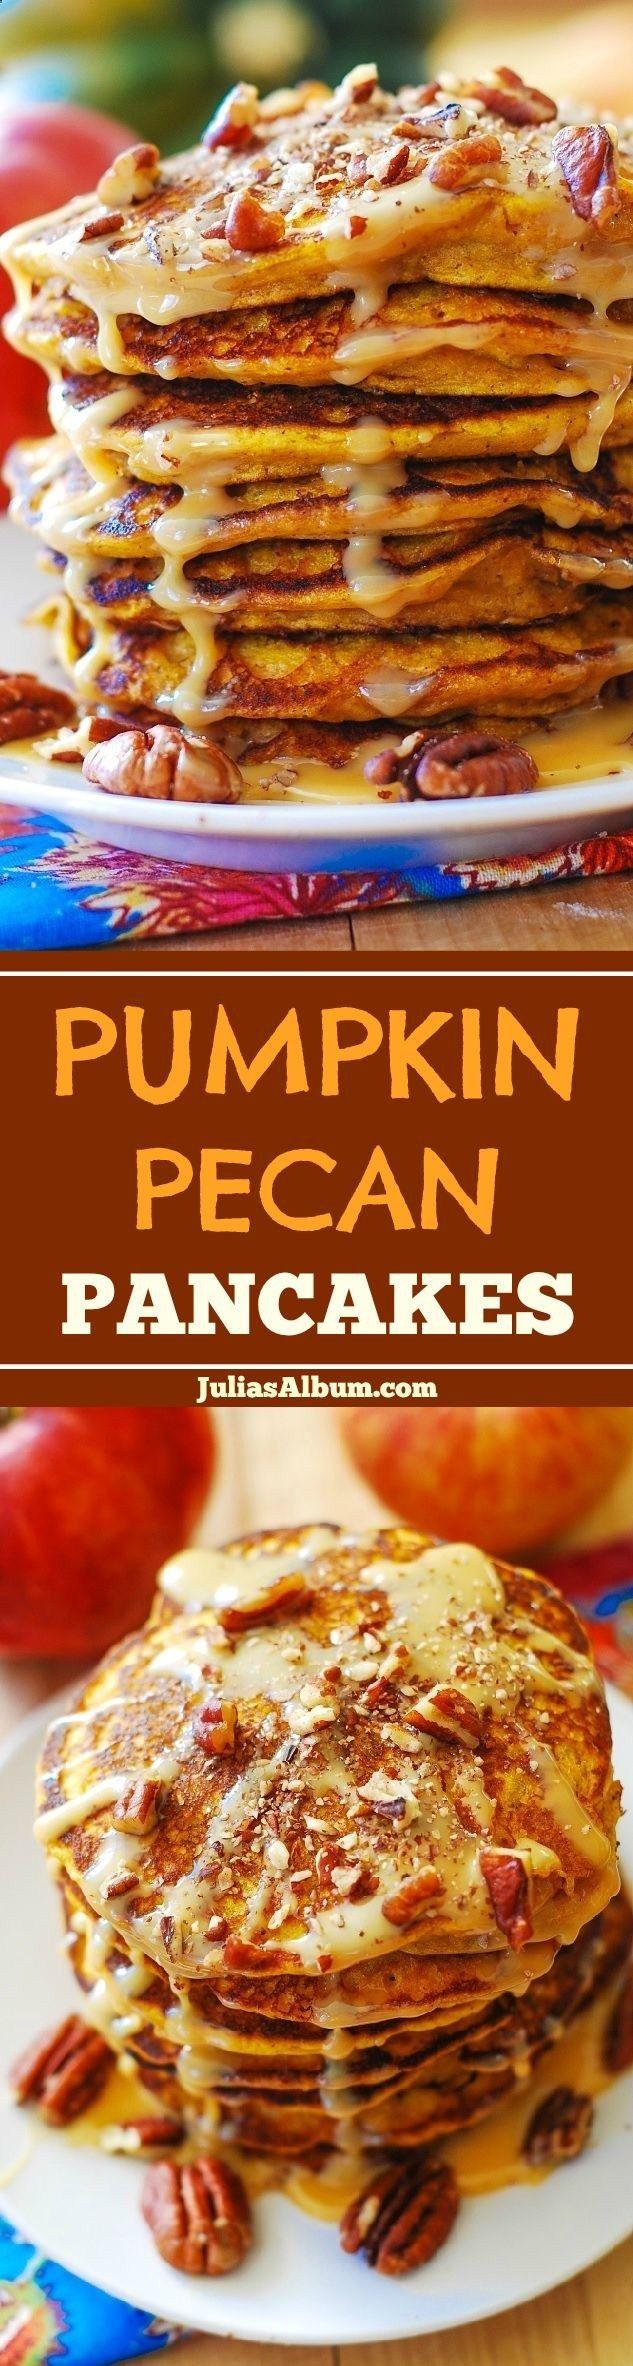 Pumpkin-Pecan Pancakes with Pecan Sauce #Thanksgiving #Fall #Holidays #breakfast via Julia/